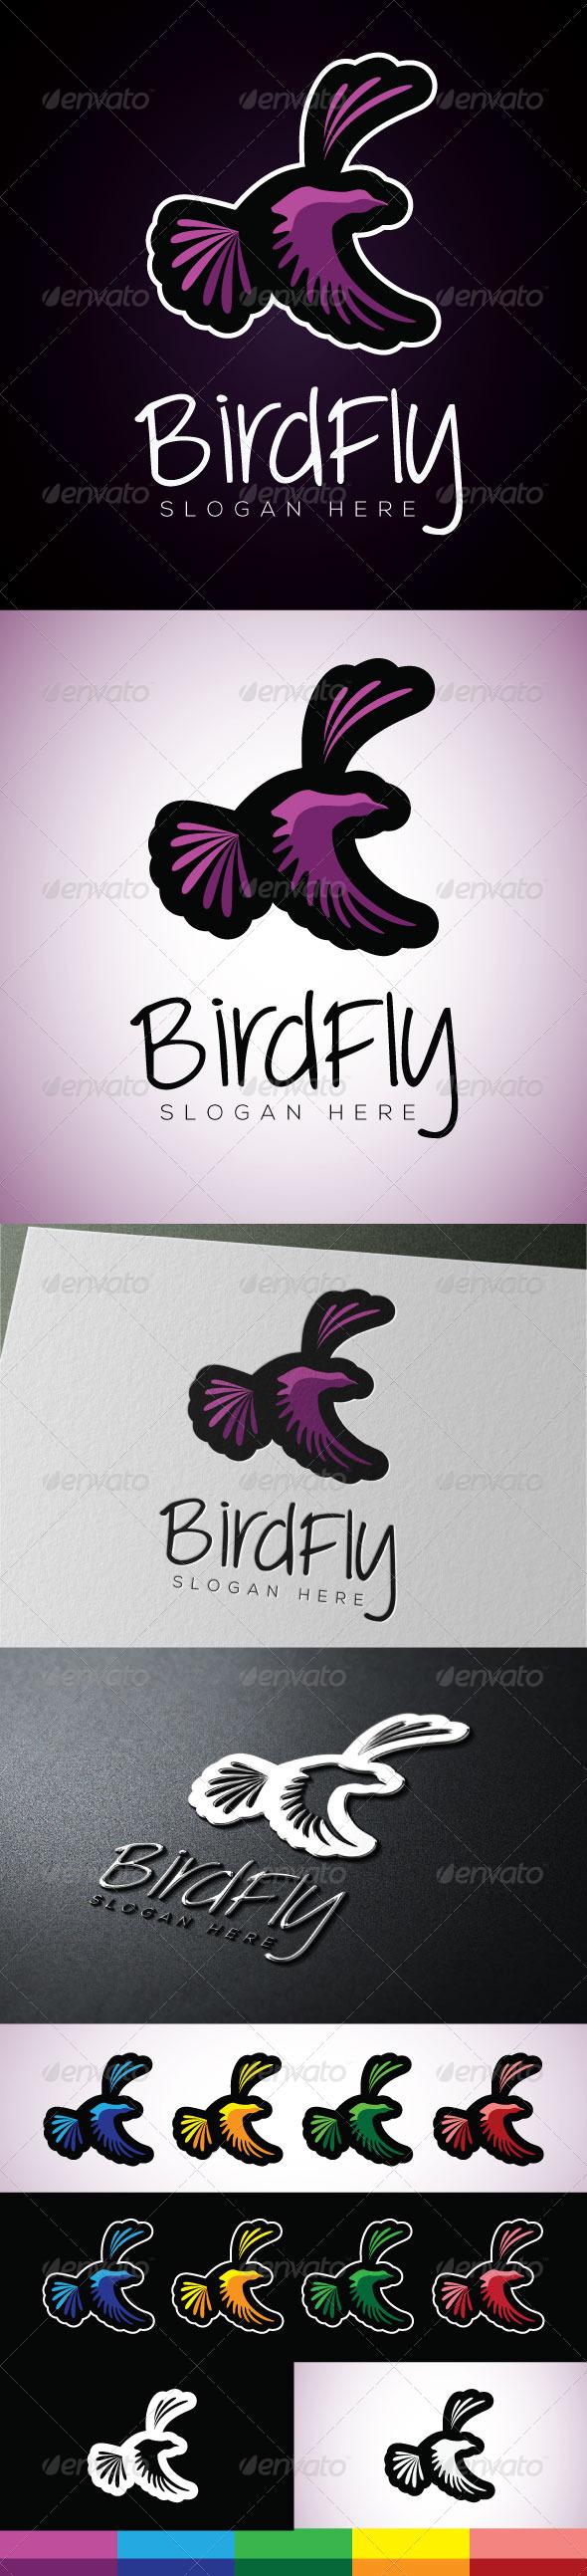 GraphicRiver Birdfly 5039139